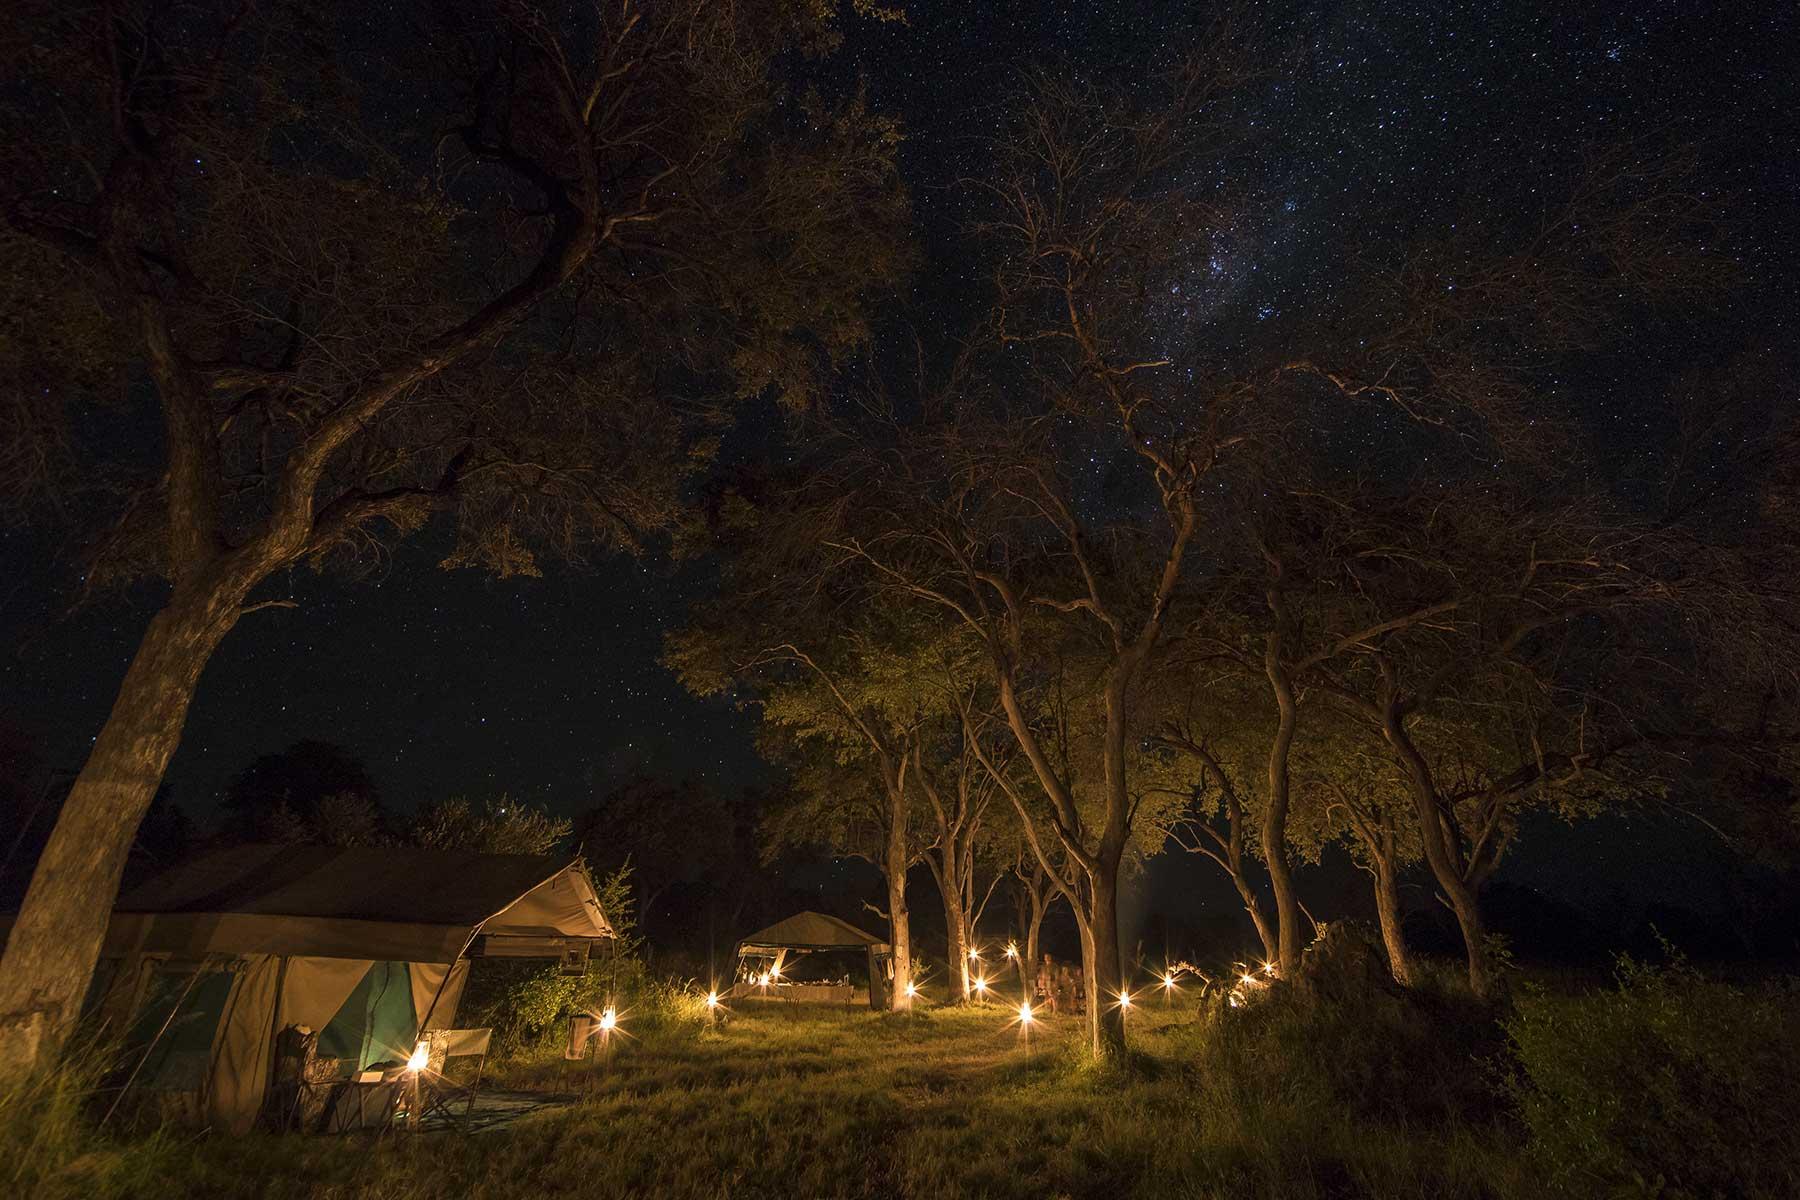 Chase Africa Safaris camp setup